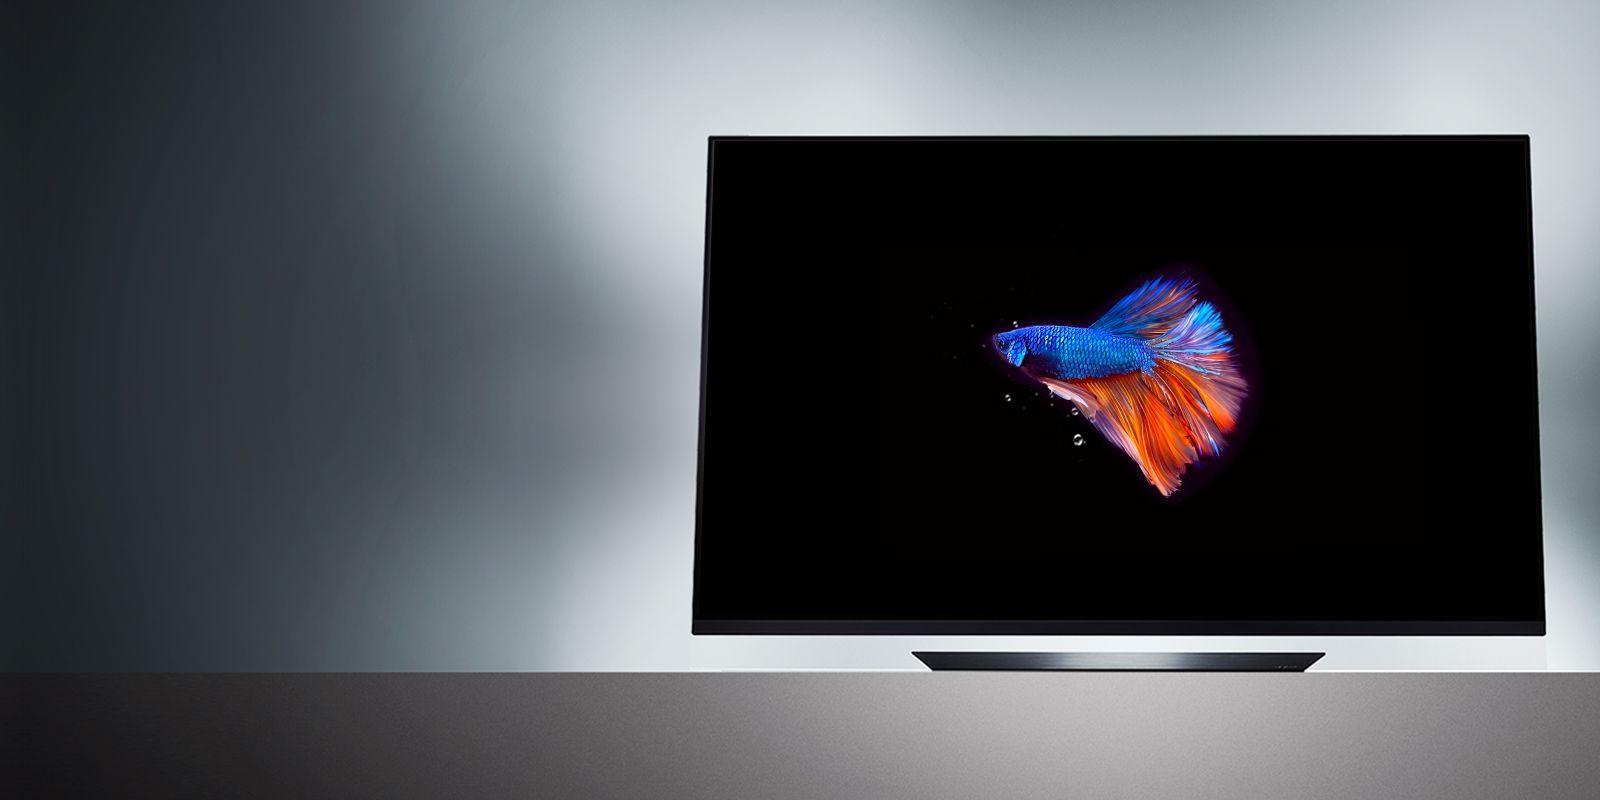 Tv 4k Wallpapers Top Free Tv 4k Backgrounds Wallpaperaccess Led Tv Lg Electronics Wallpaper